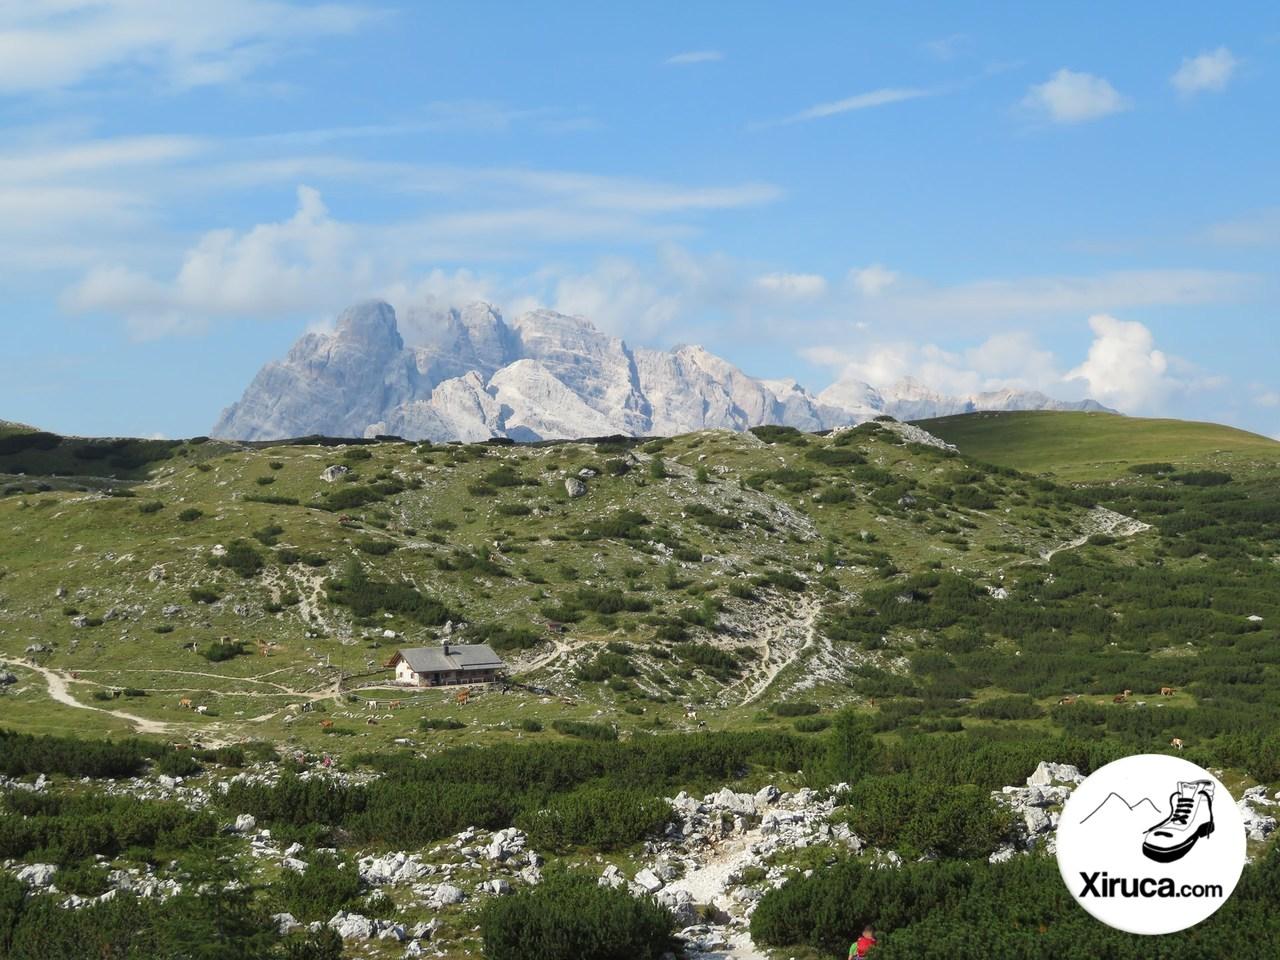 Monte Cristallo y Langalm